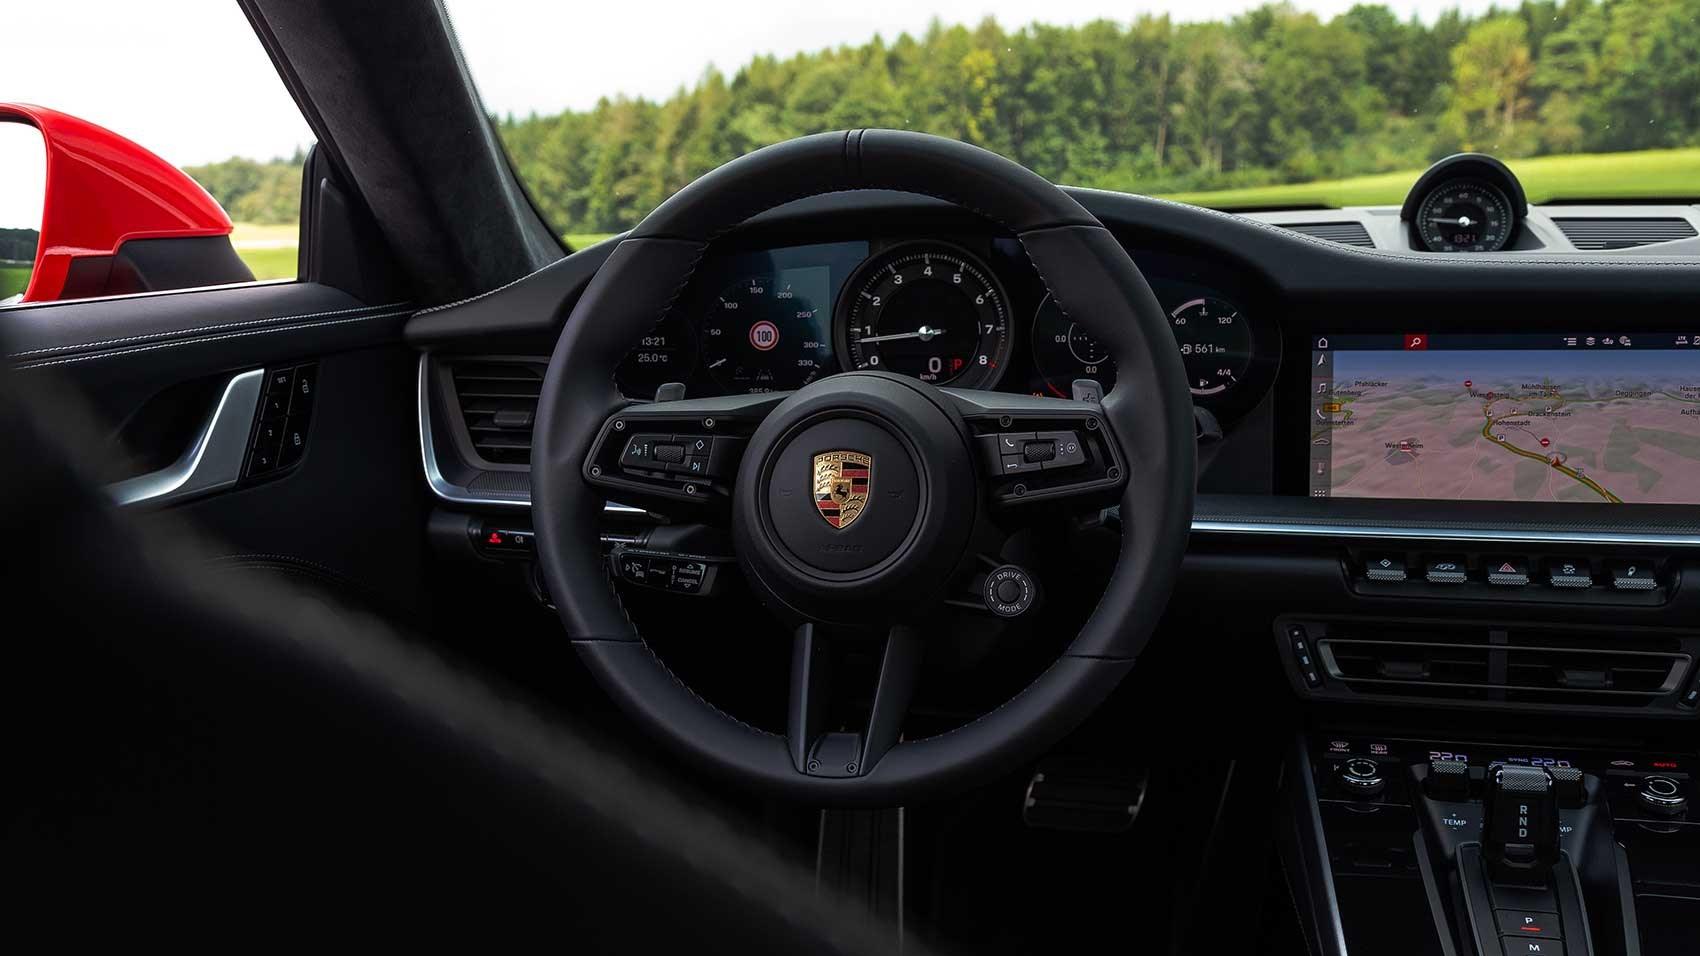 Porsche 911 Carrera 2 interior (new 992 generation)